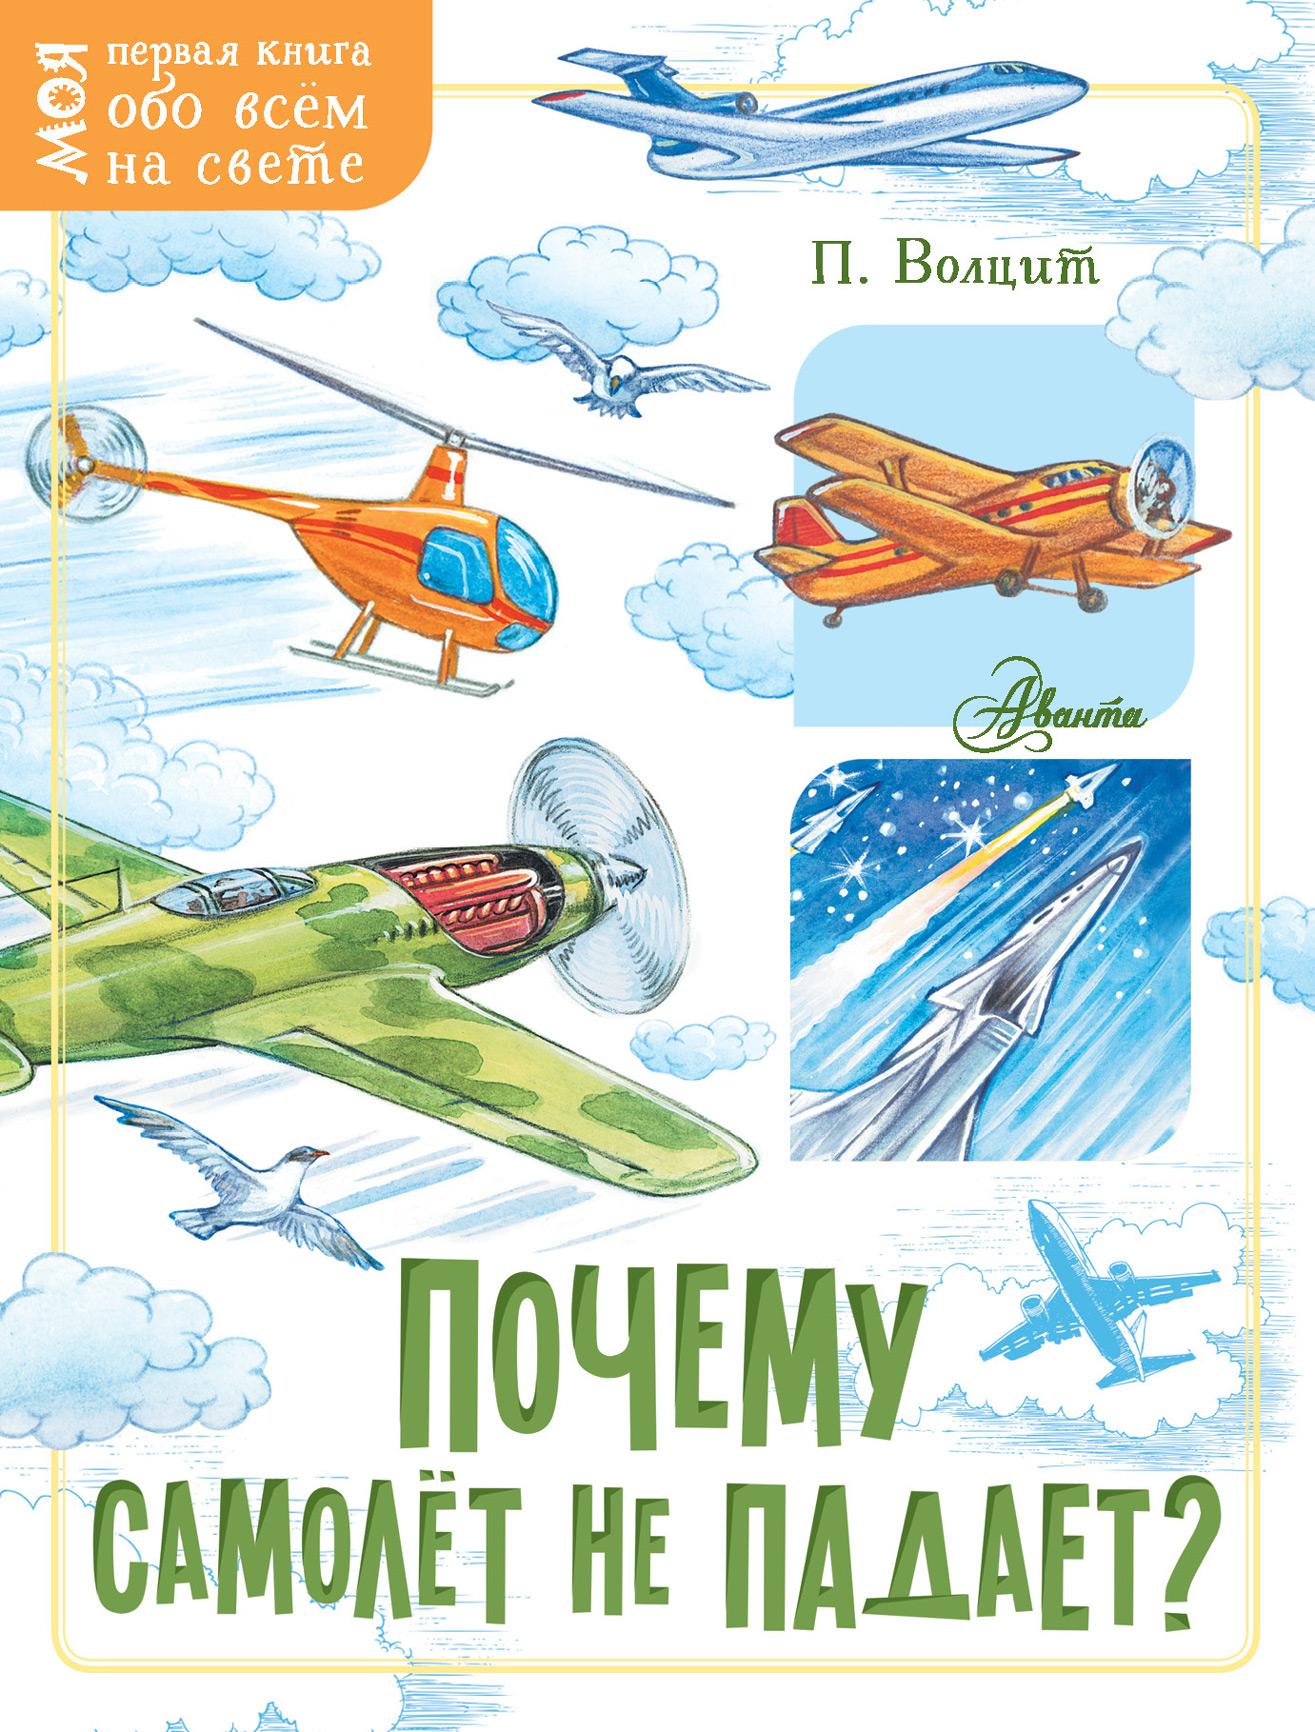 П. М. Волцит Почему самолёт не падает?